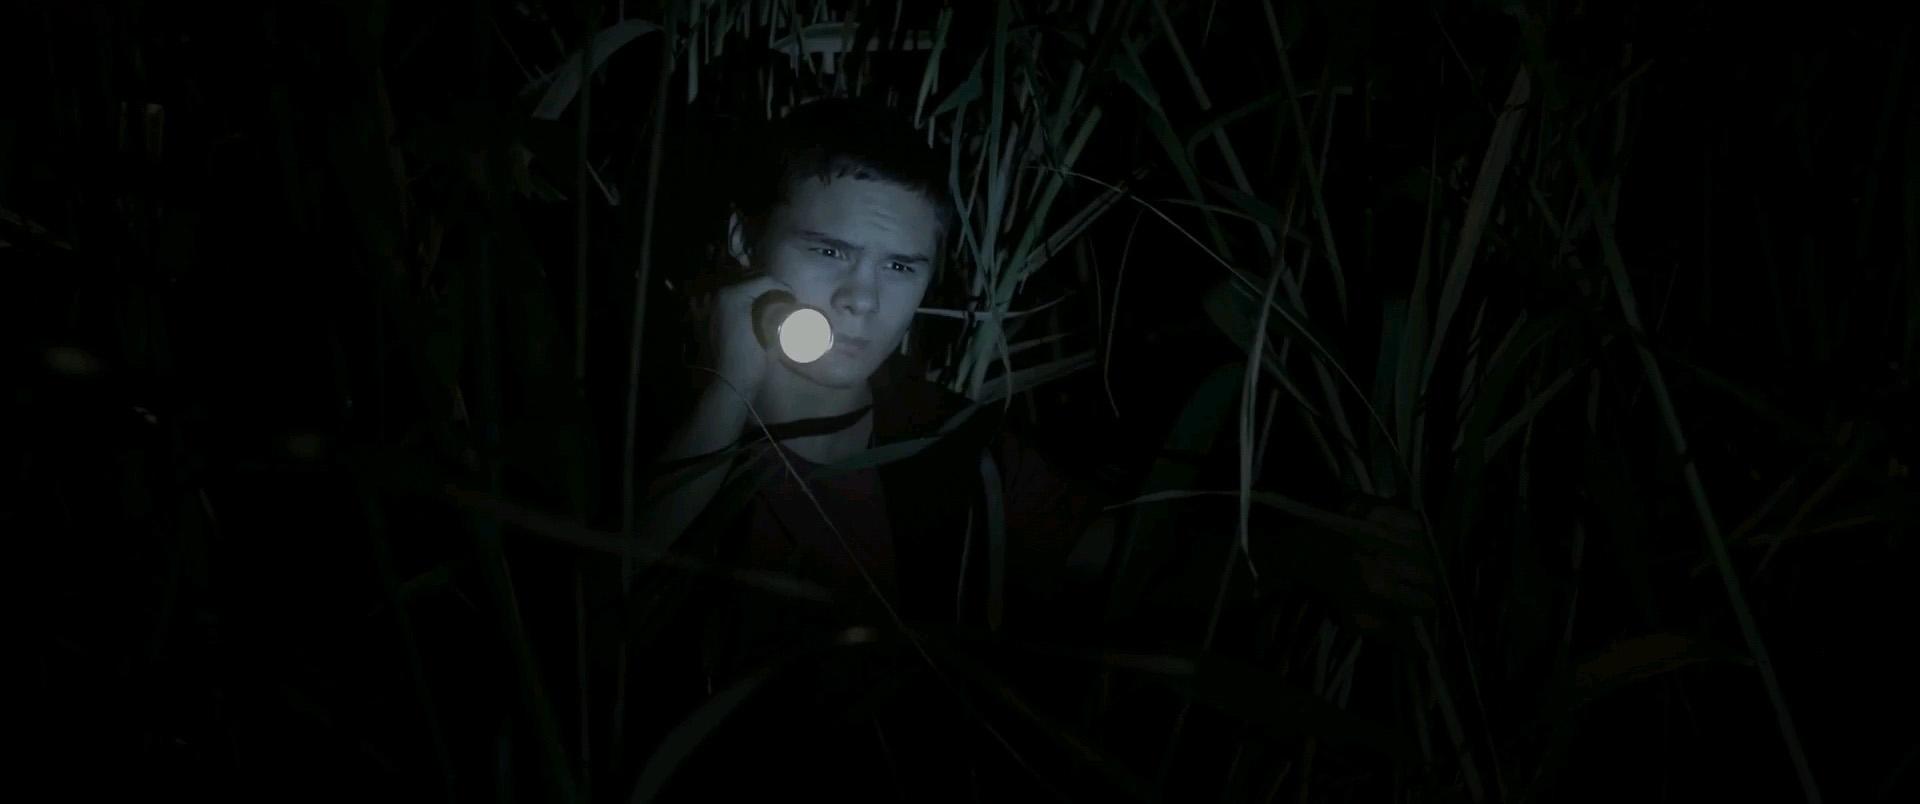 Daha | 2018 | Yerli Film | NF | WEB-DL | XviD | Sansürsüz | 1080p - m720p - m1080p | WEB-DL | Tek Link